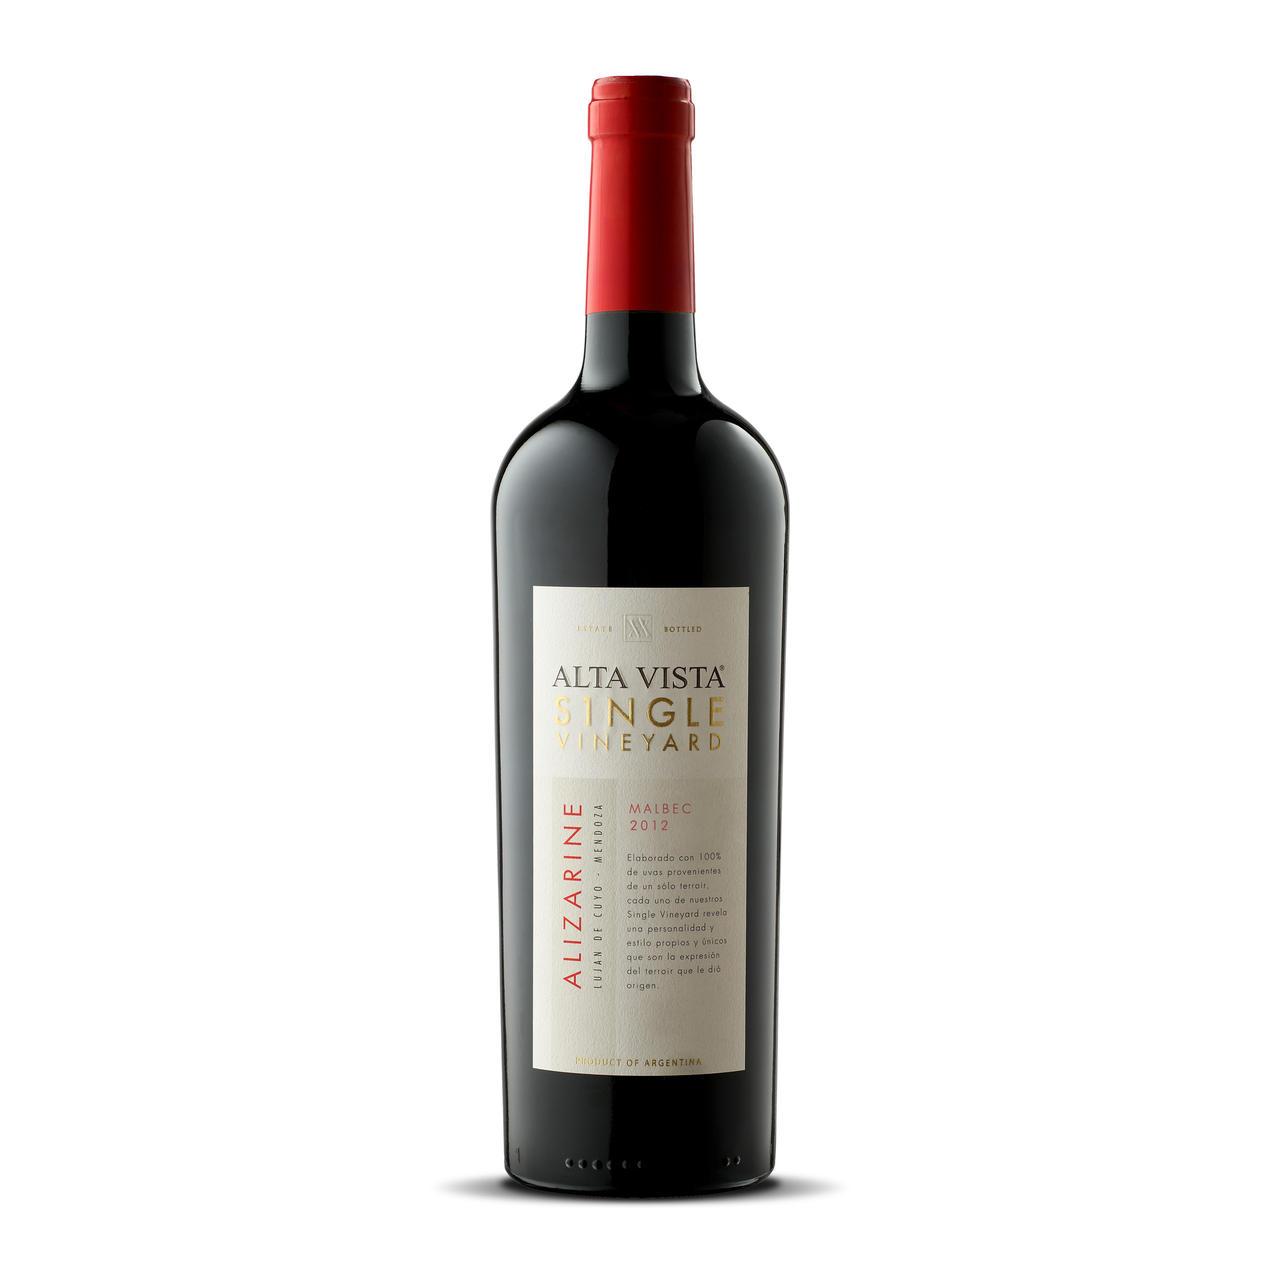 Altavista Single Vineyard Alizarine 2011